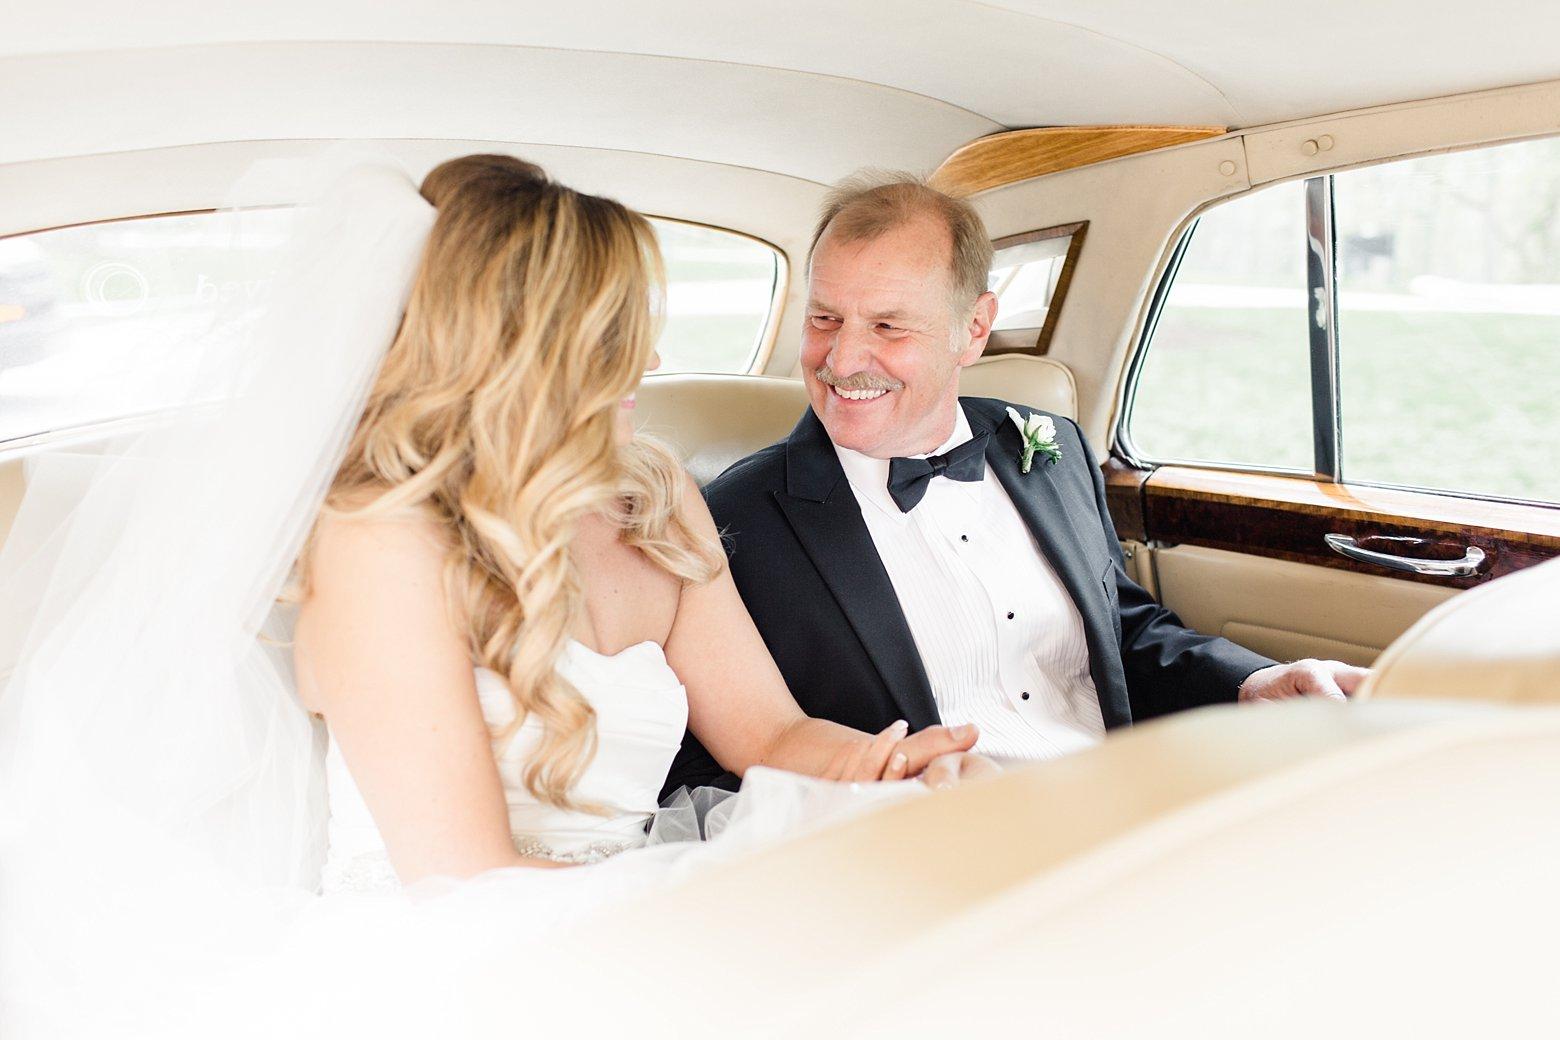 lauren_fair_photography_april_lynn_designs_stasia_matt_spring_cairnwood_estate_wedding_northeast_philadelphia_blush_pink_gold_wedding_invitation_stationery_0041